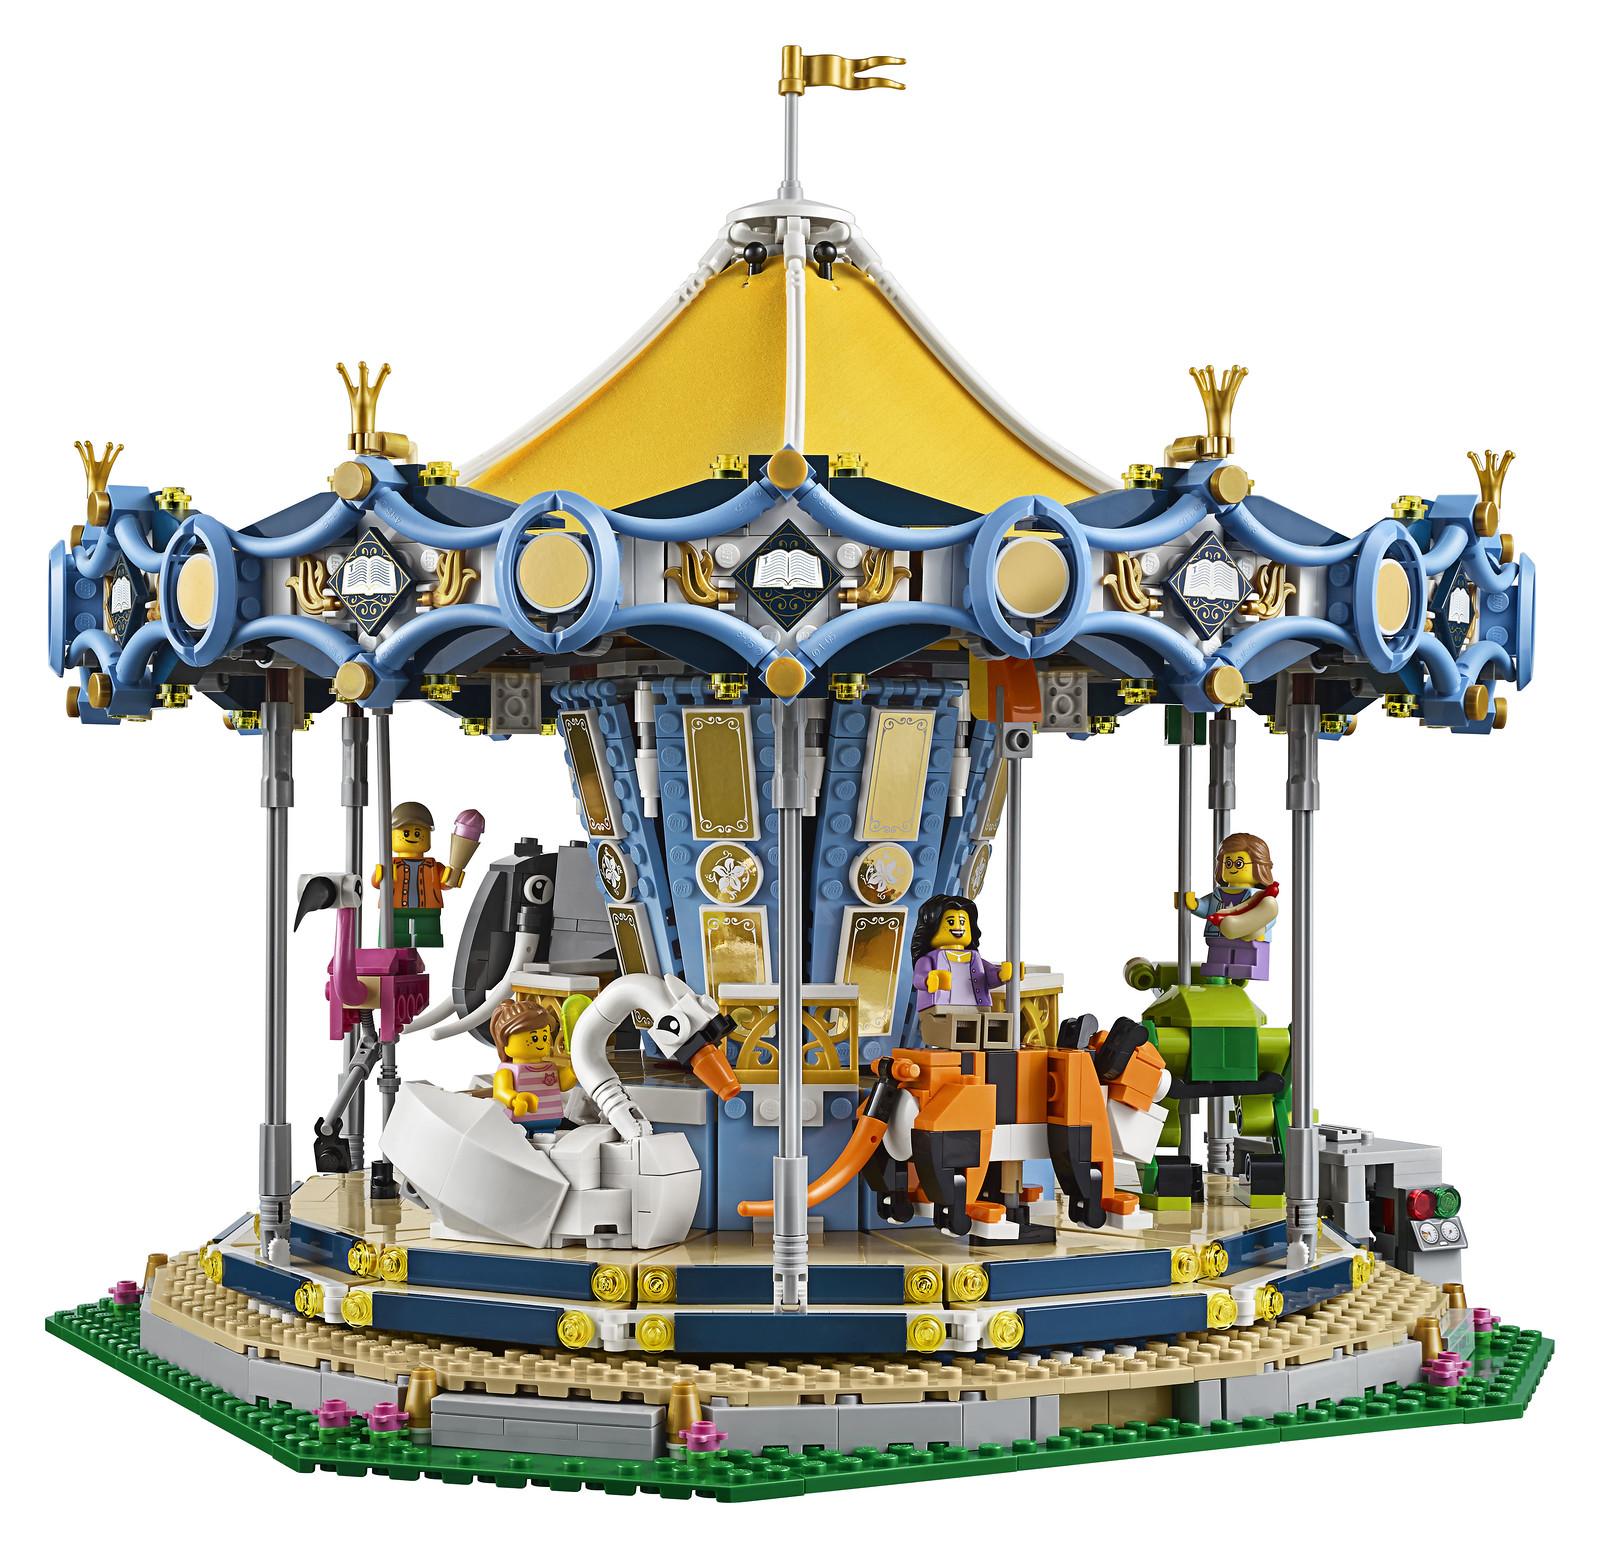 LEGO Creator Expert 10257 - Carousel